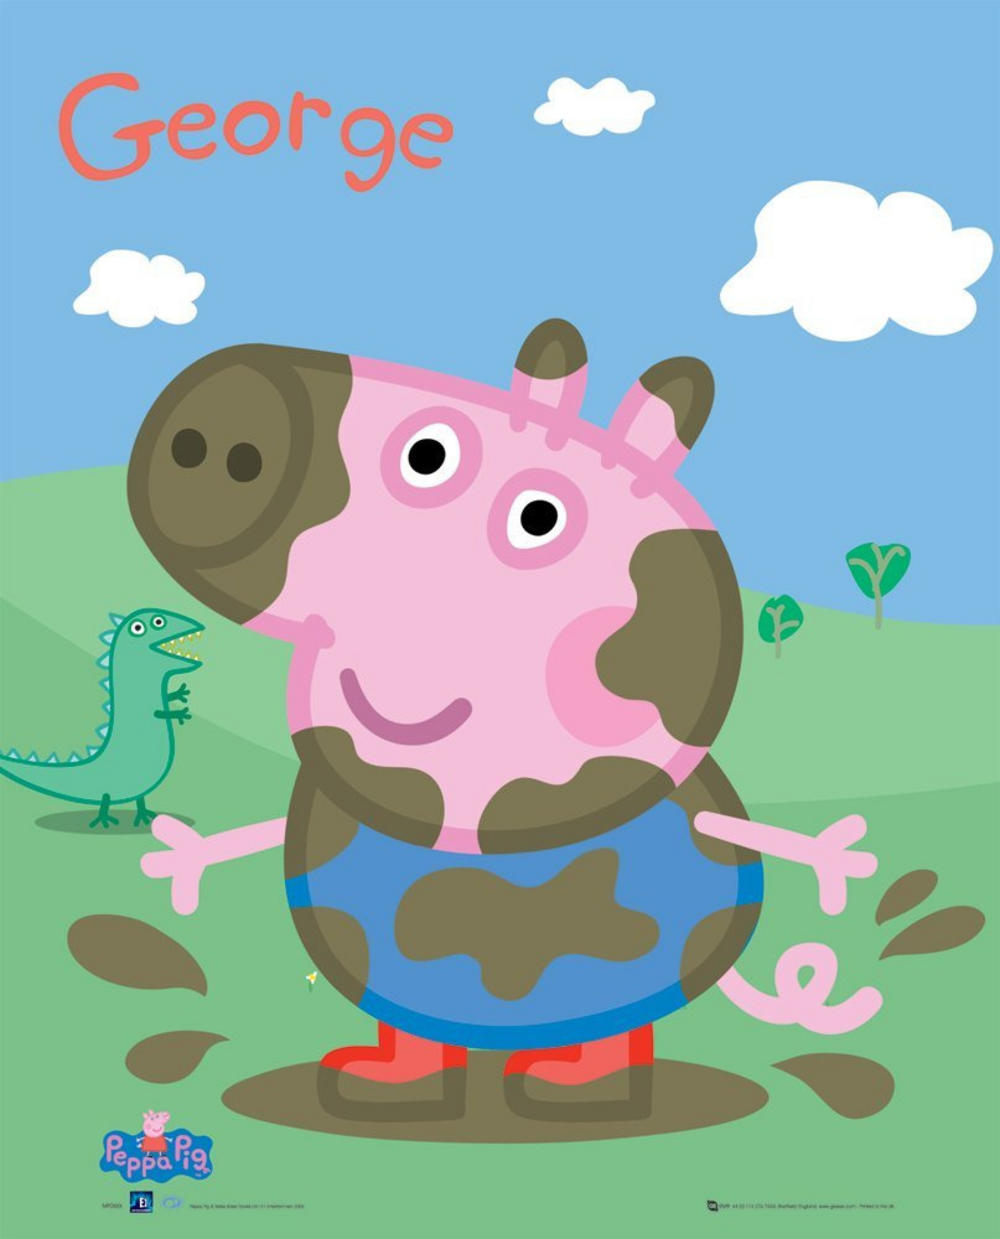 Poste 14448 B6486 Peppa Pig George Mini Poster 40cm X 50cm(796) on Peppa Pig Fairy Invitations And Free